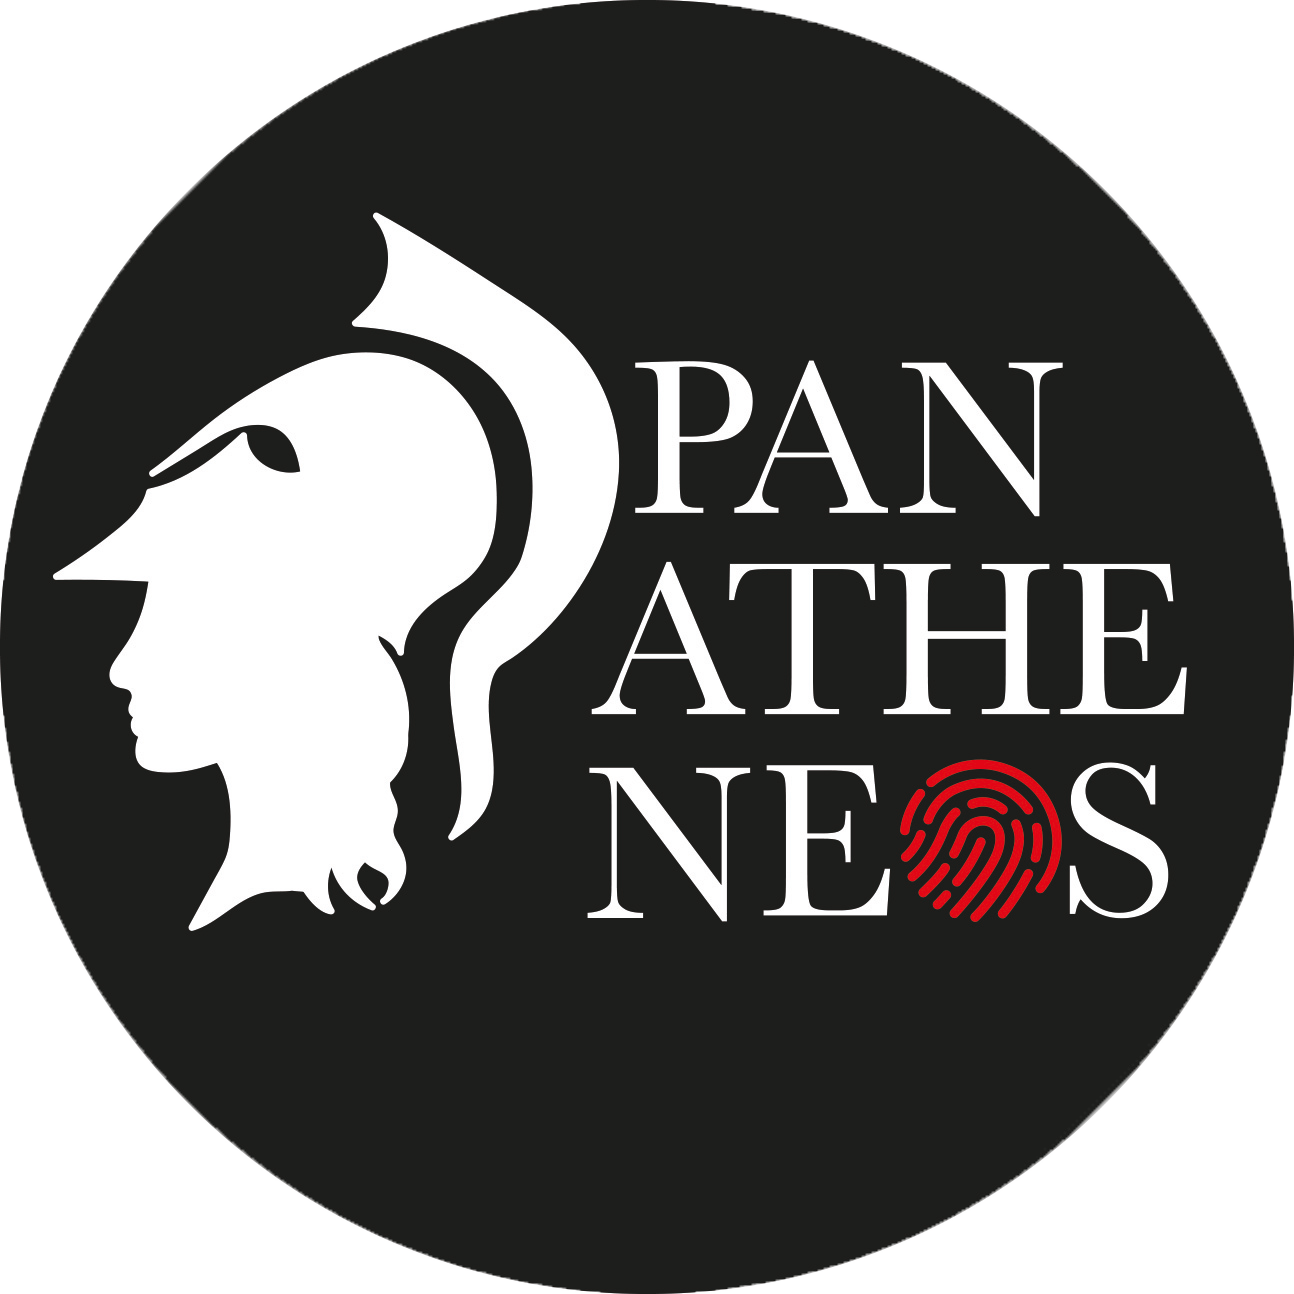 Panatheneos.com